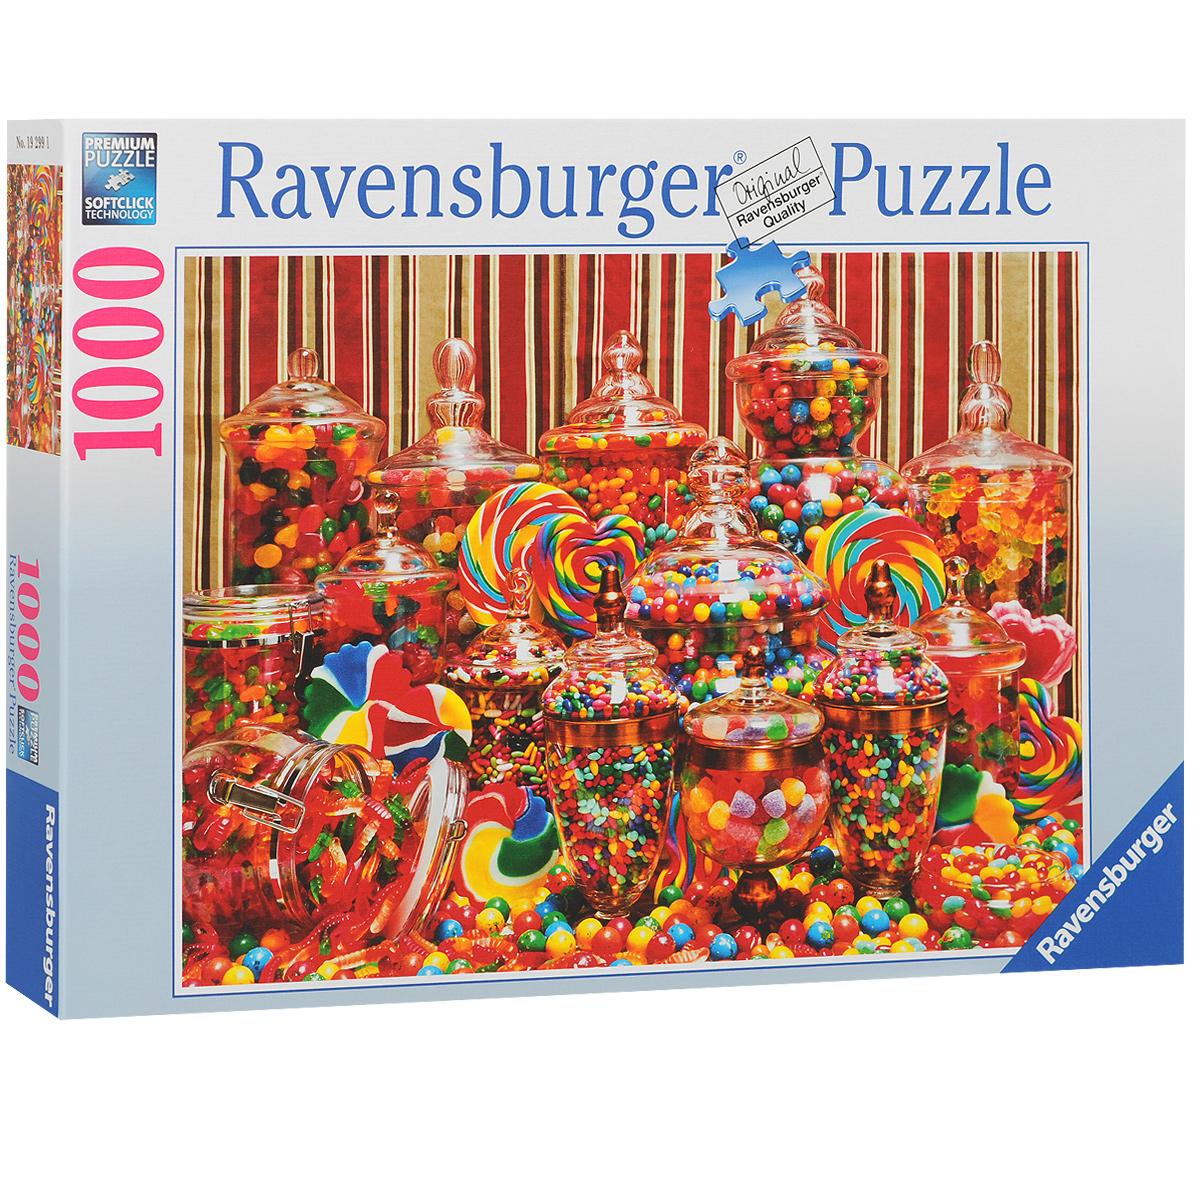 Ravensburger Конфетный рай. Пазл, 1000 элементов